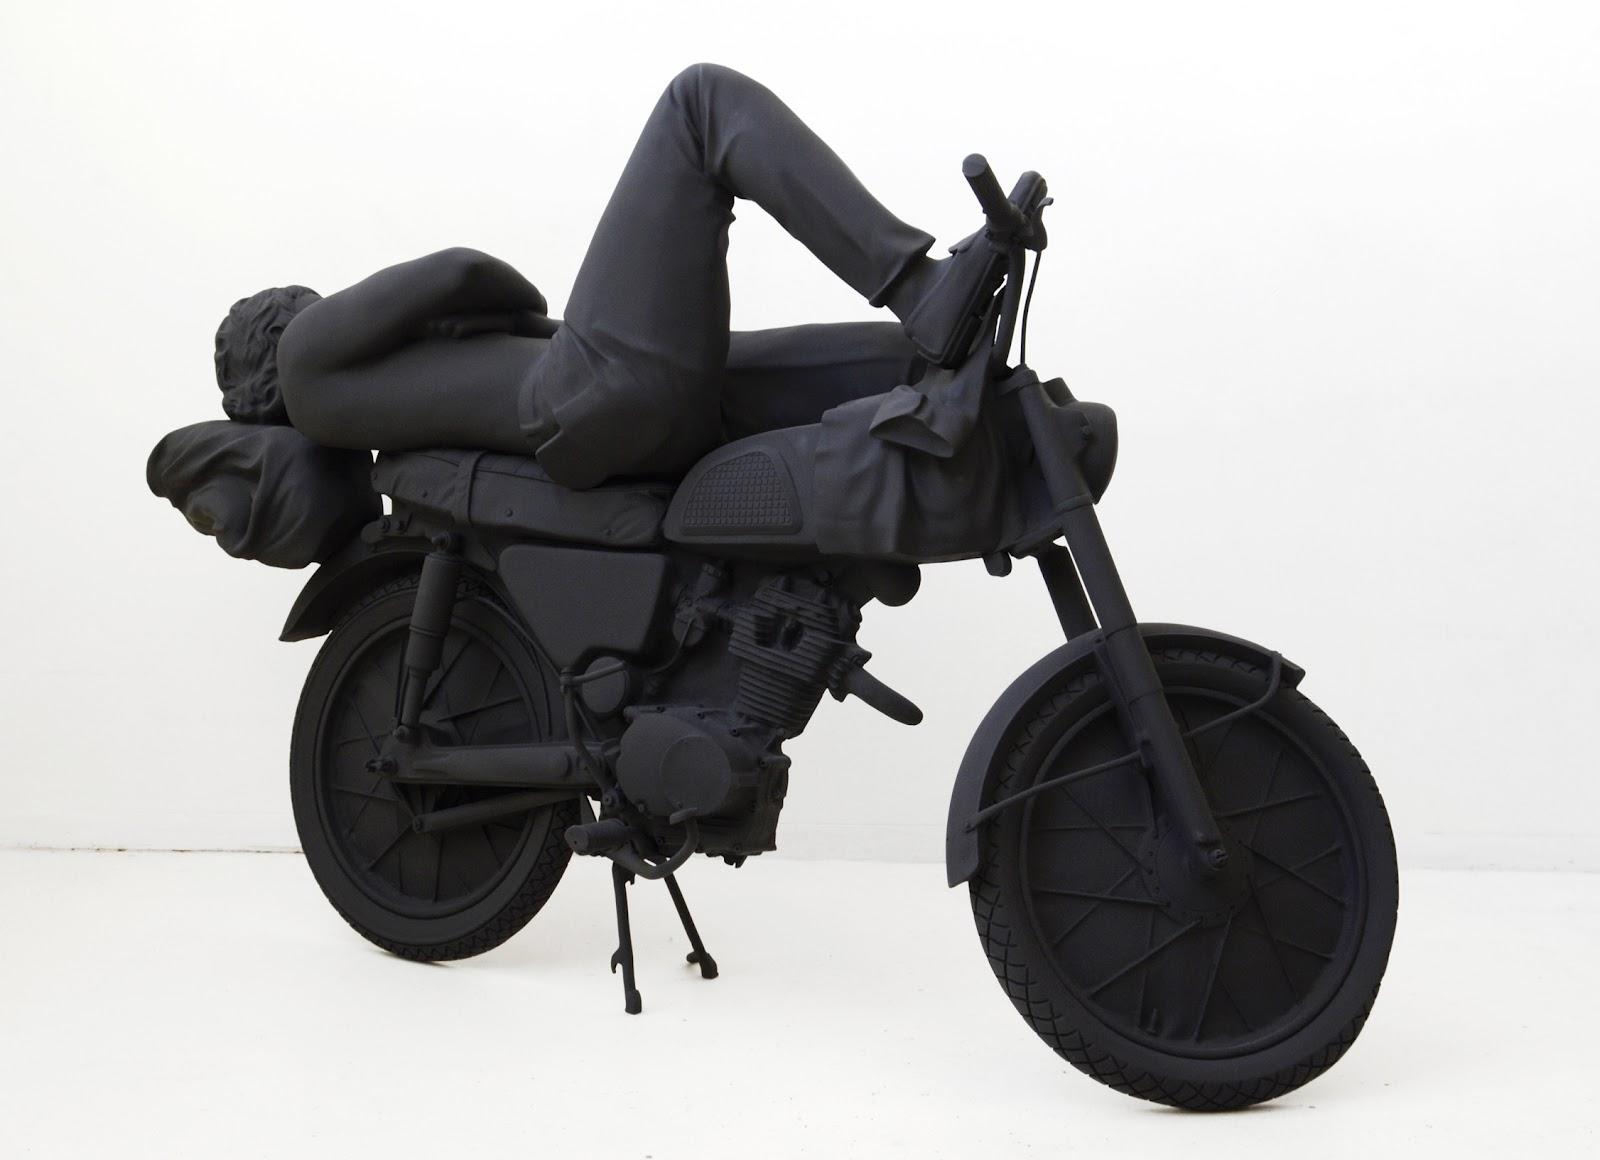 atelier blast modelmaking d cor sculpture moulage prototype objet en r sine objets en. Black Bedroom Furniture Sets. Home Design Ideas